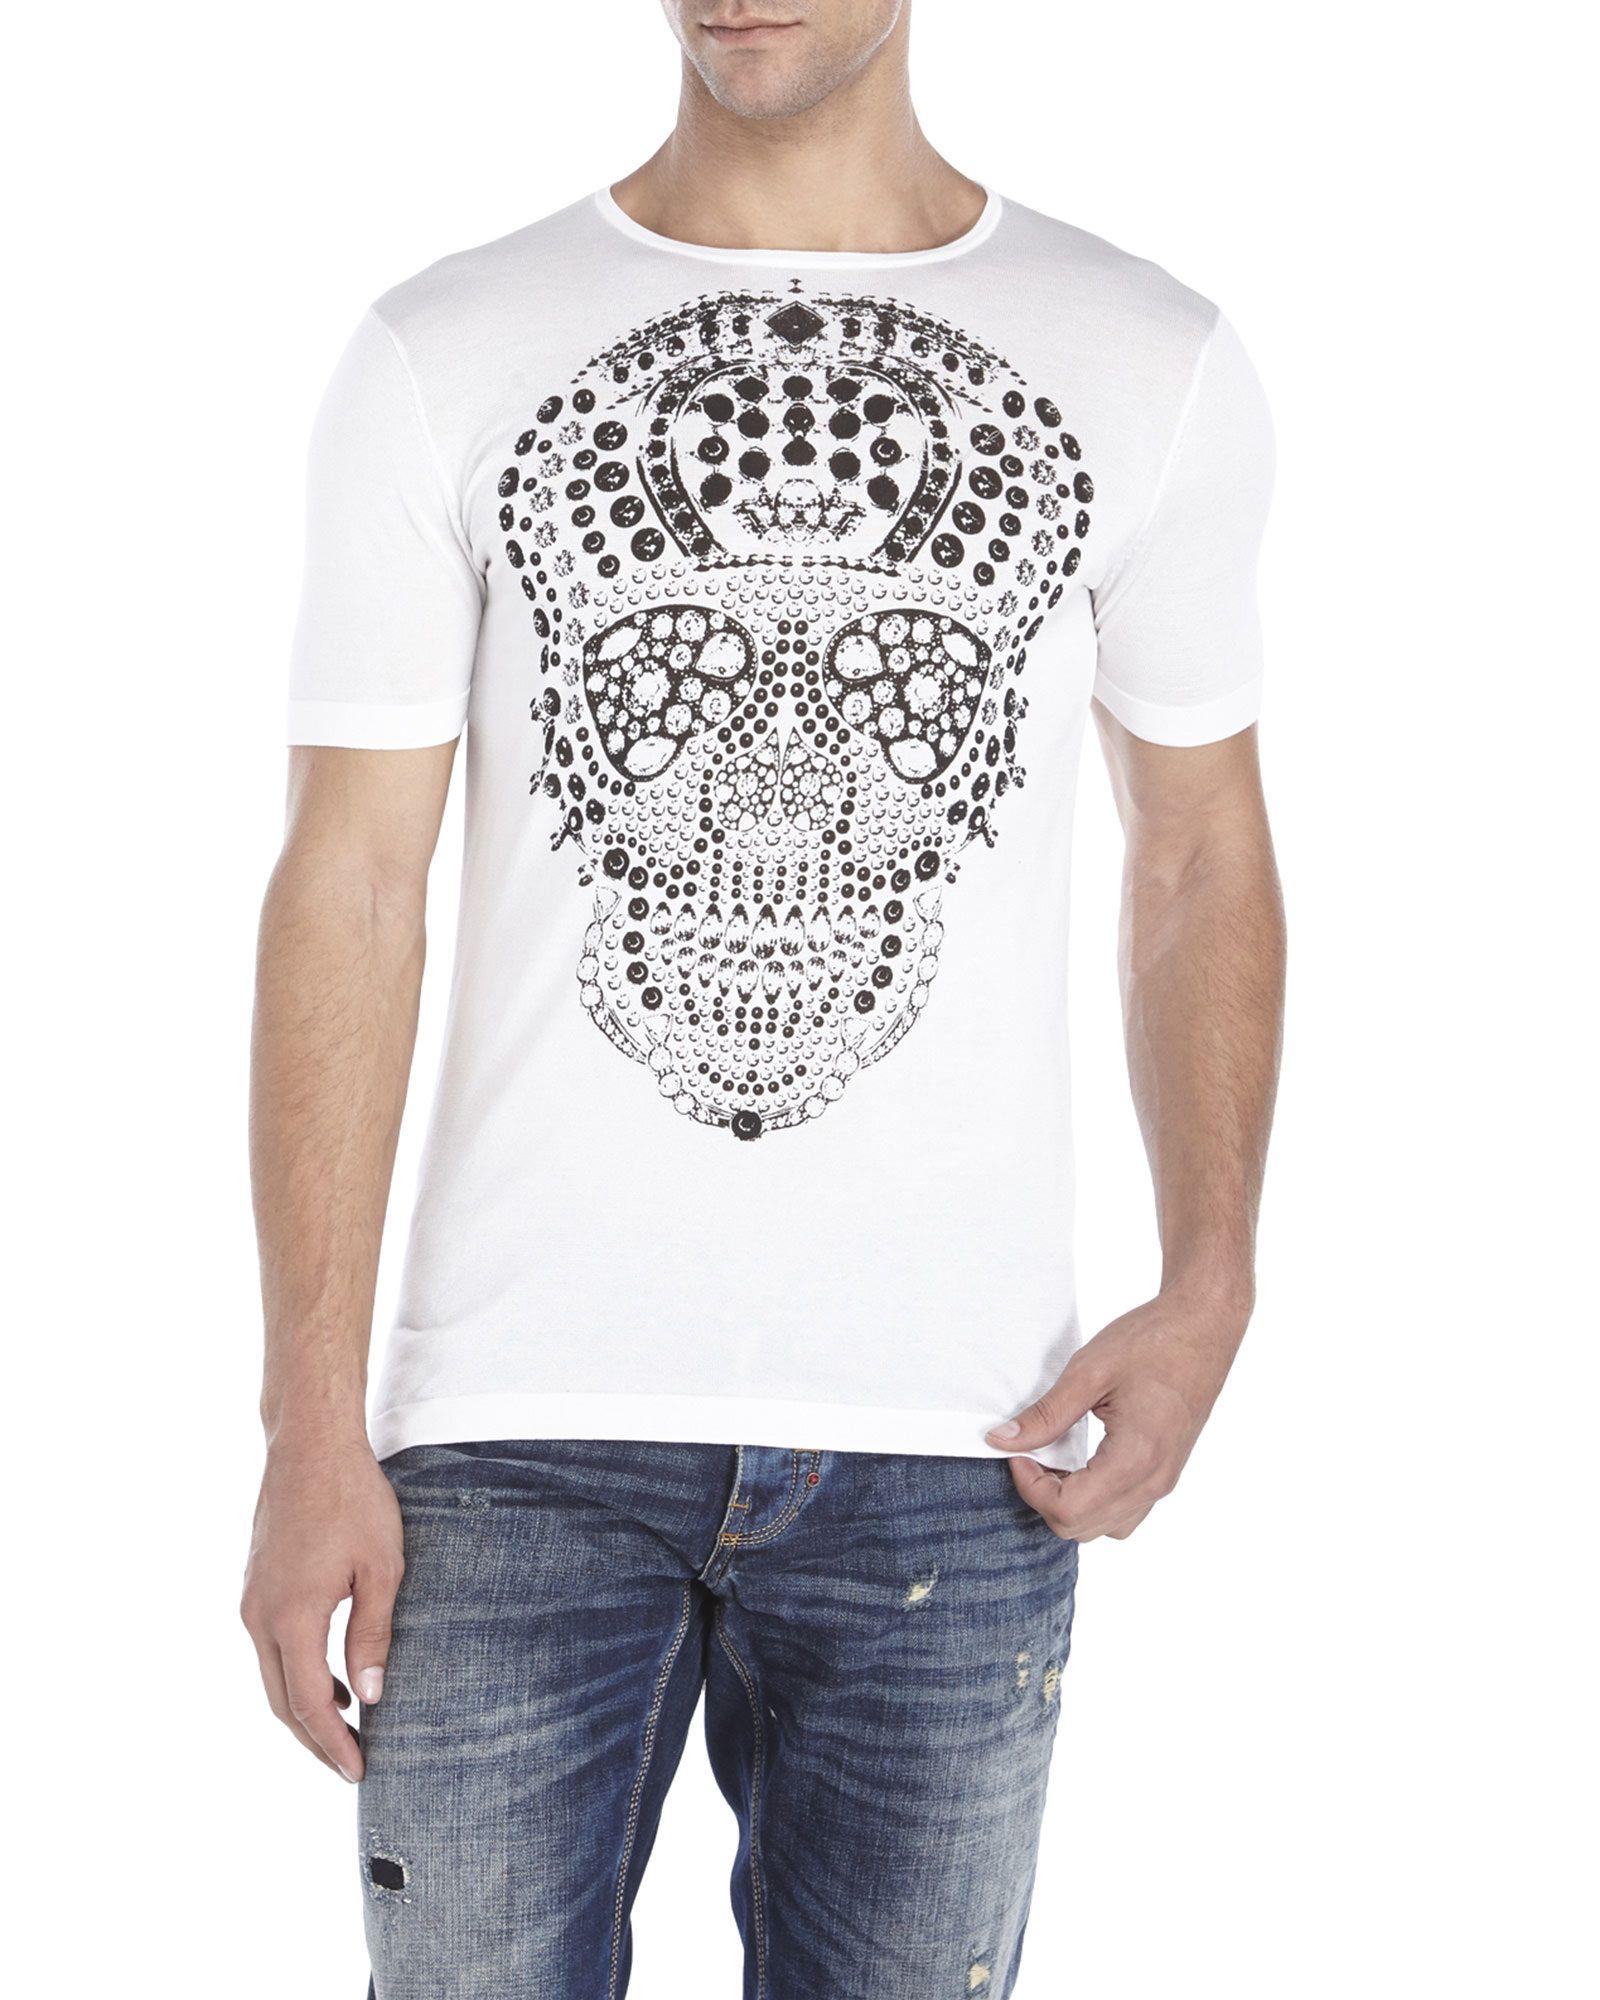 54fb286e ANTONY MORATO White Graphic Skull Tee | Custom Men's Tee Shirts ...